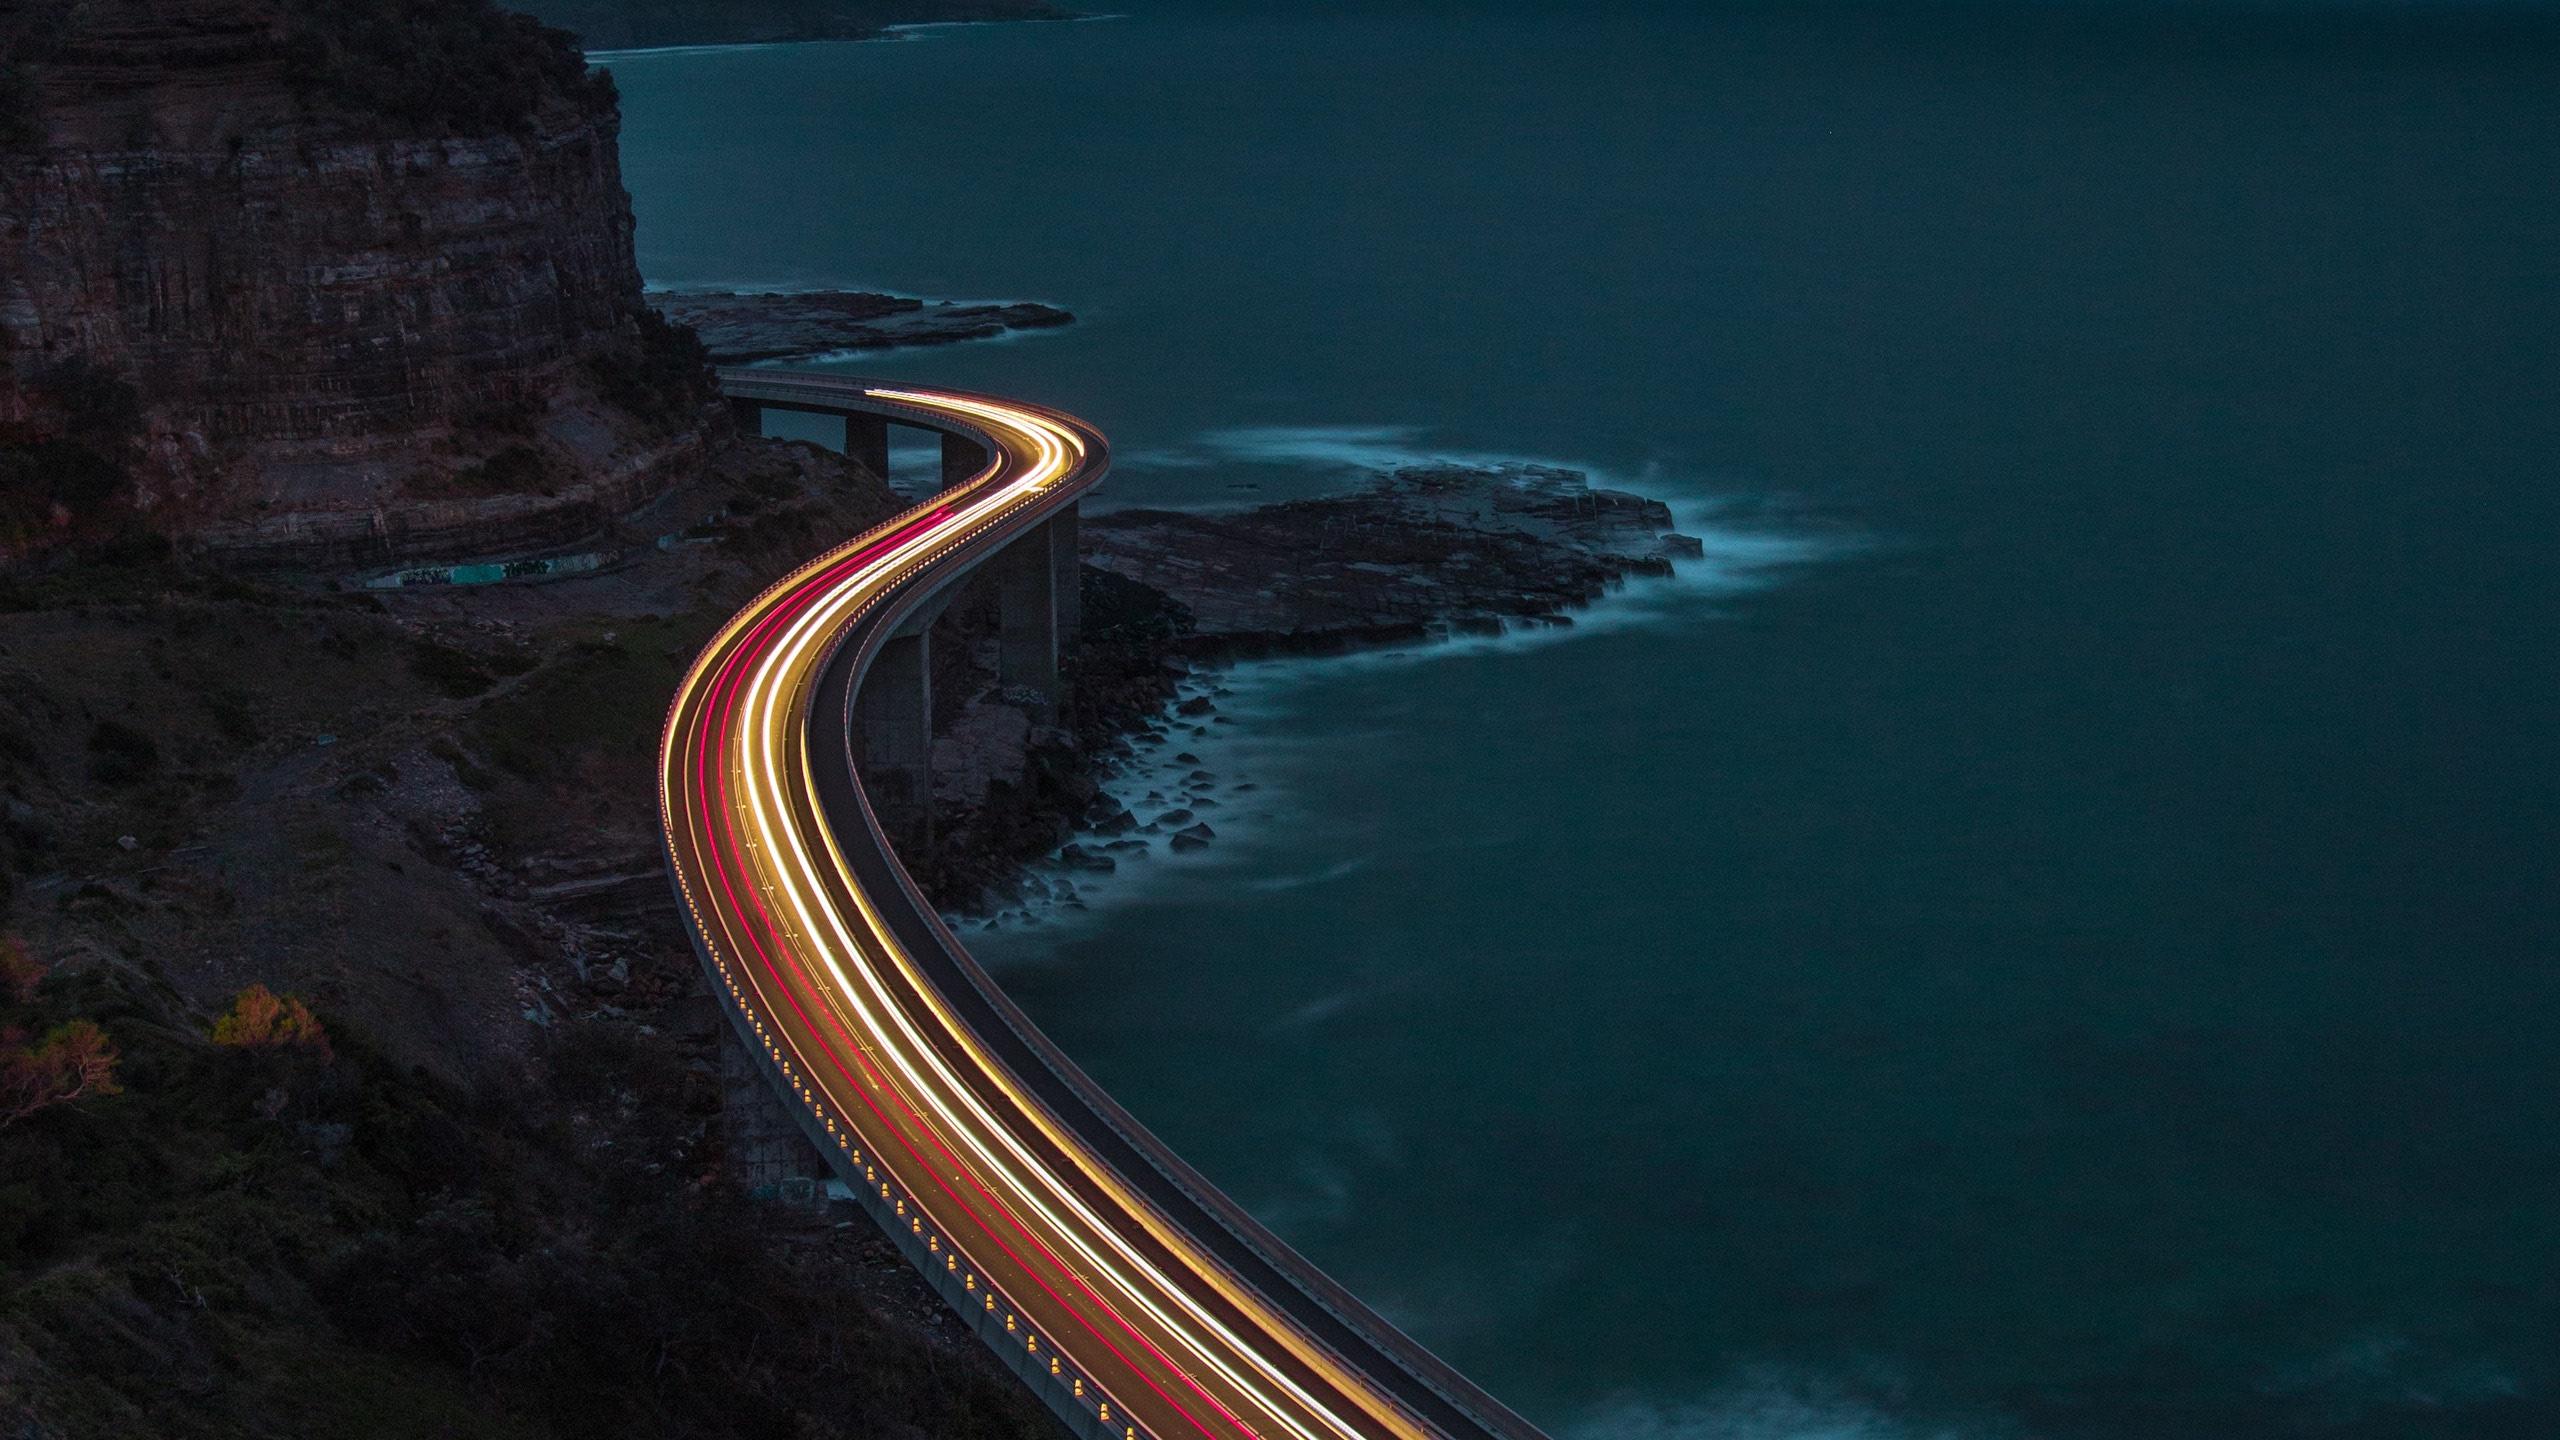 long exposure photo of a highway bridge over the sea